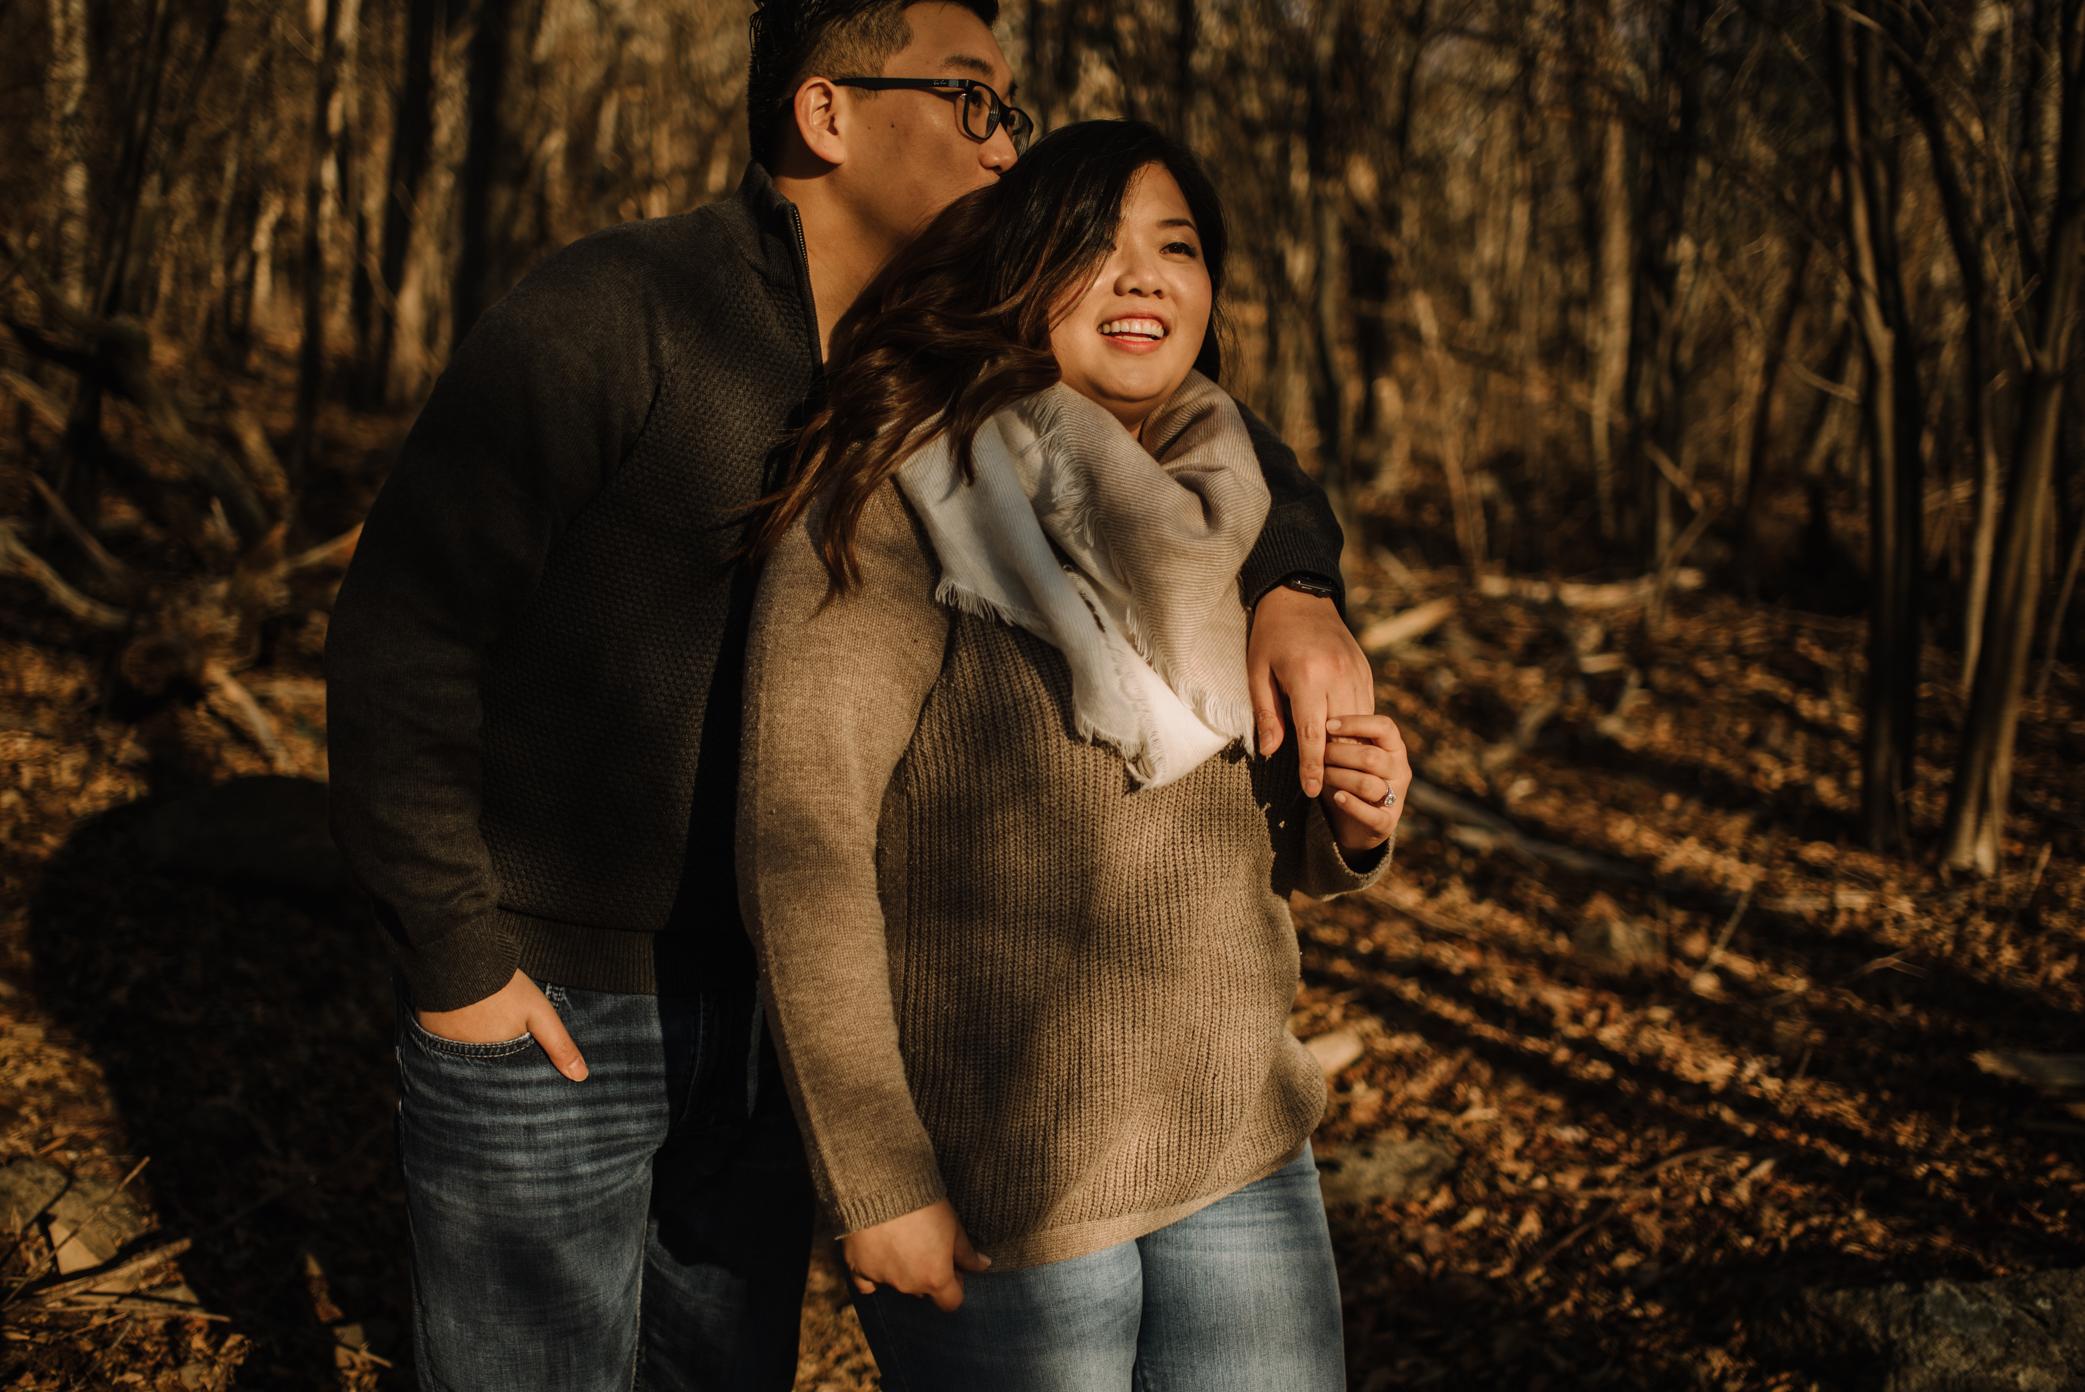 Joshua and Kristina - Shenandoah National Park - Skyline Drive - Winter Engagement Session Photographer - White Sails Creative_13.JPG